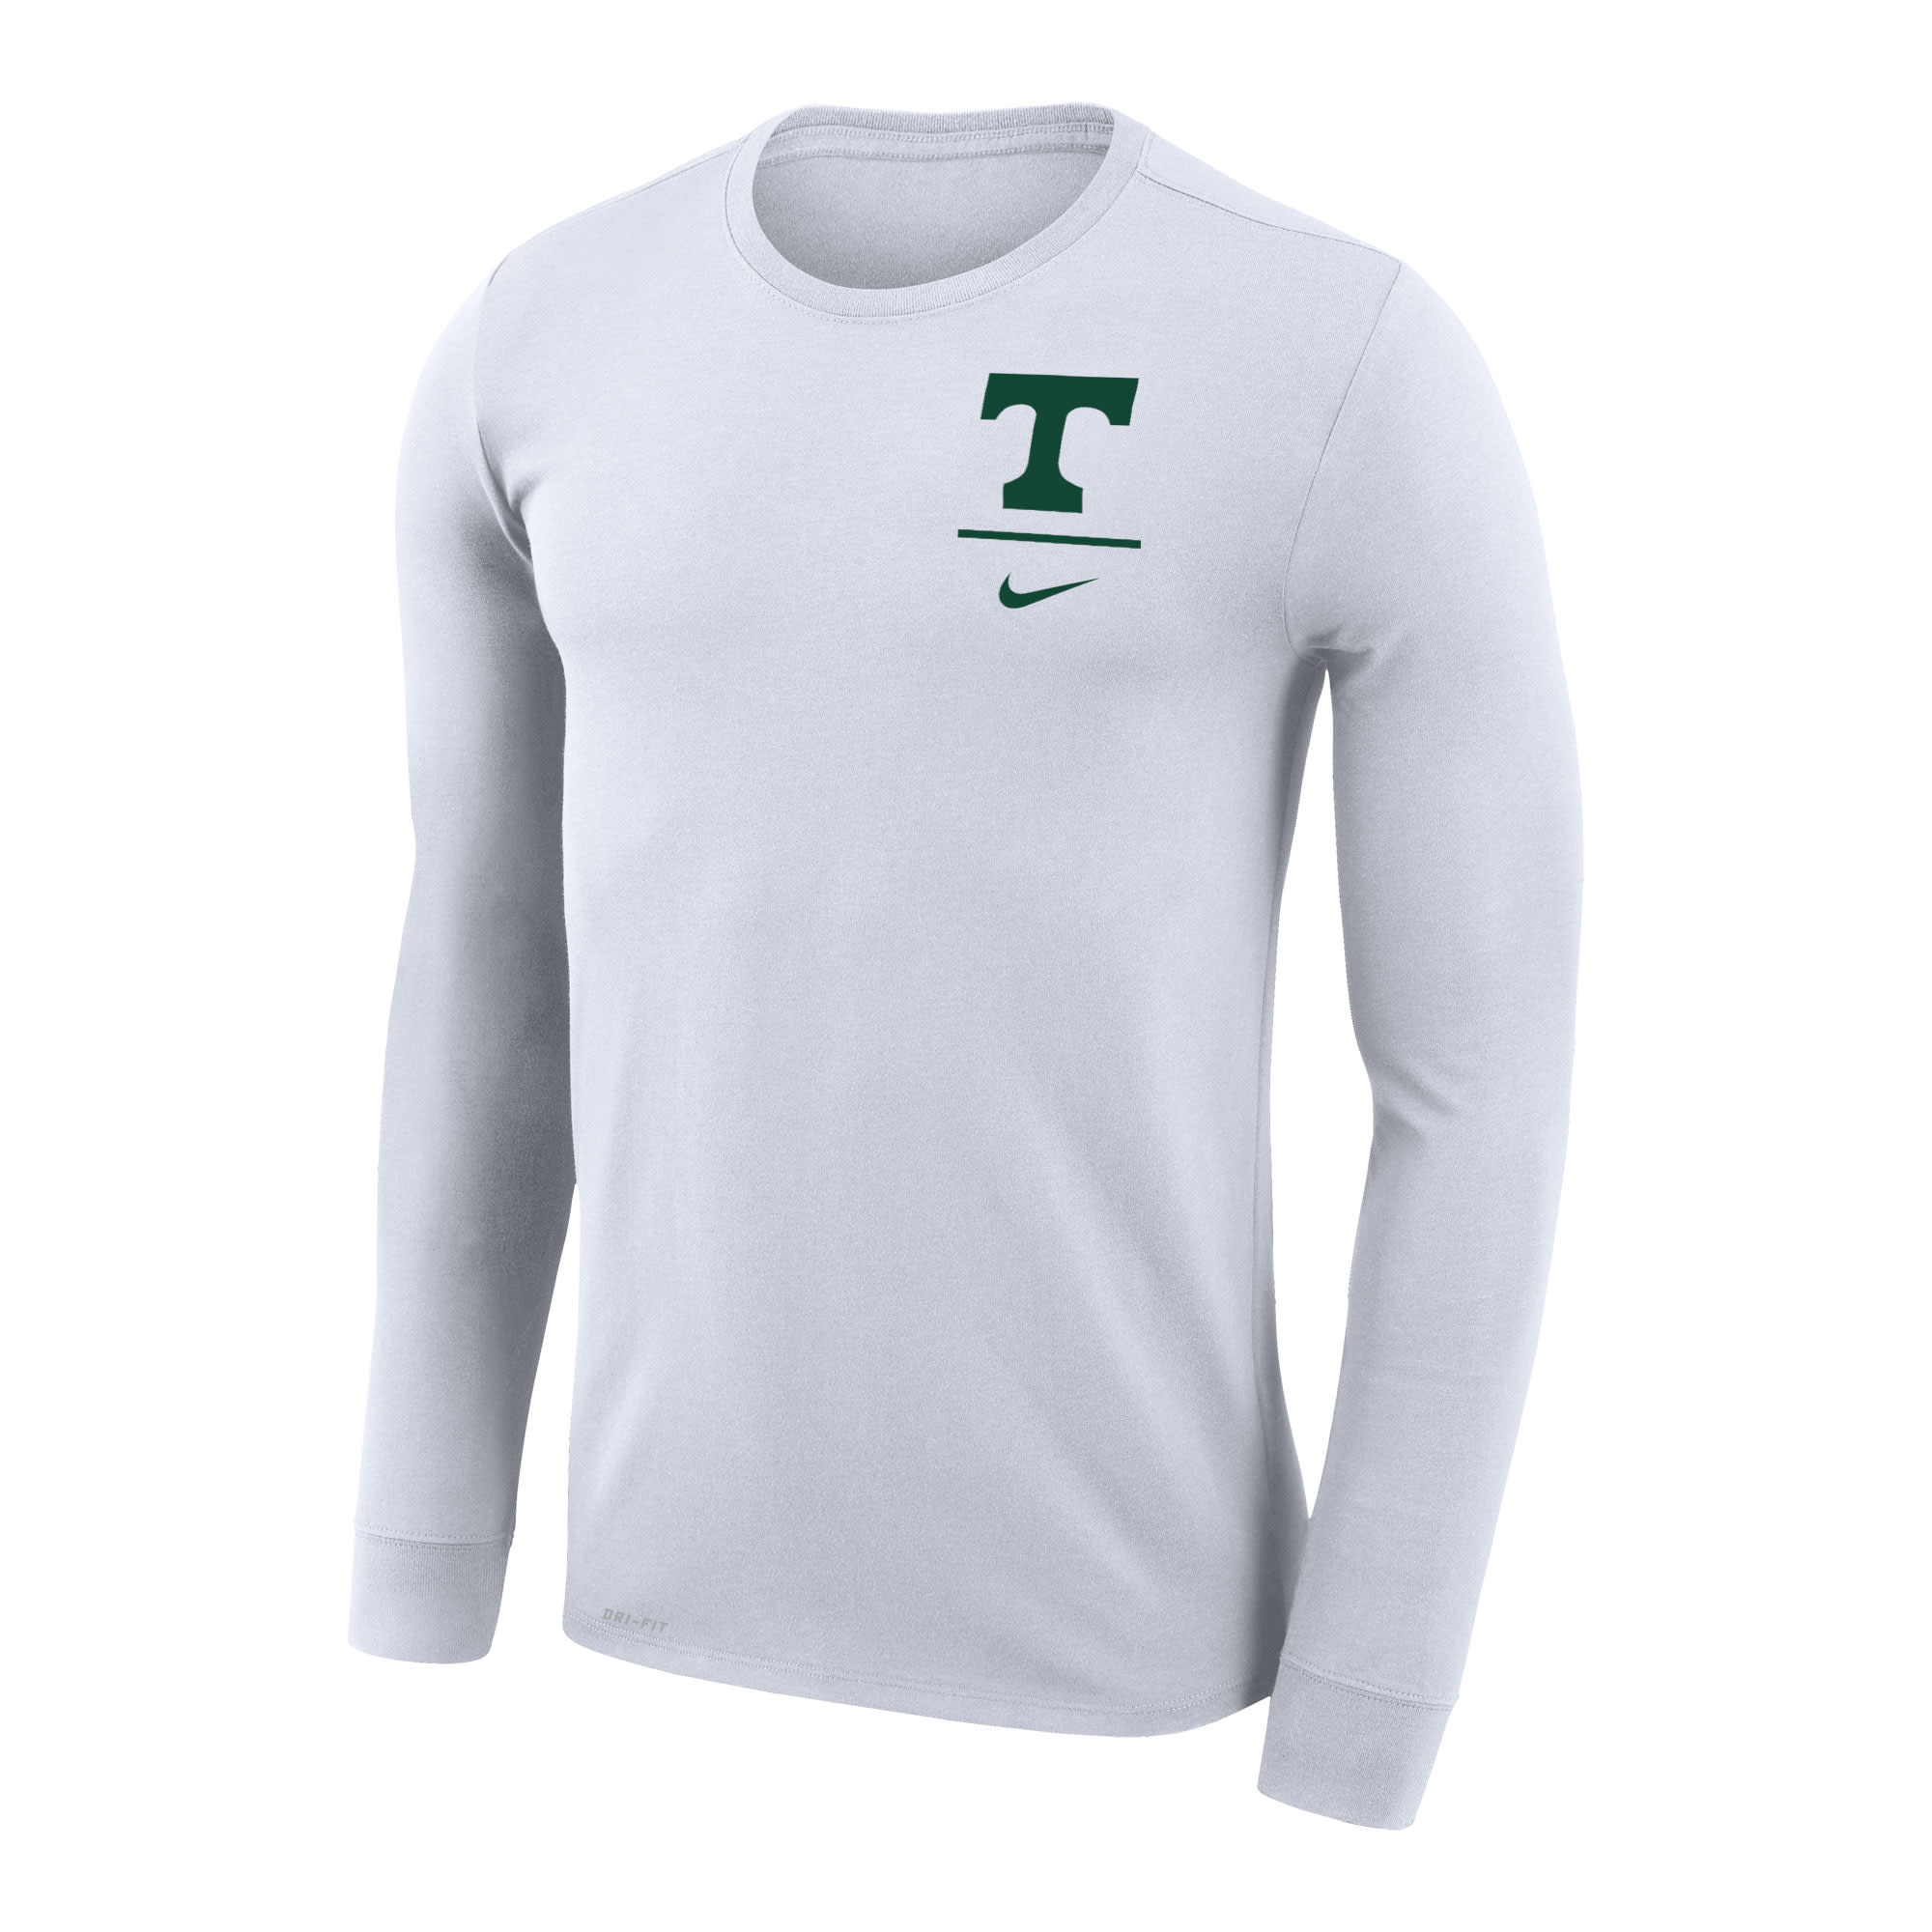 Nike Nike 2019 Dri fit Long Sleeve Left Chest White